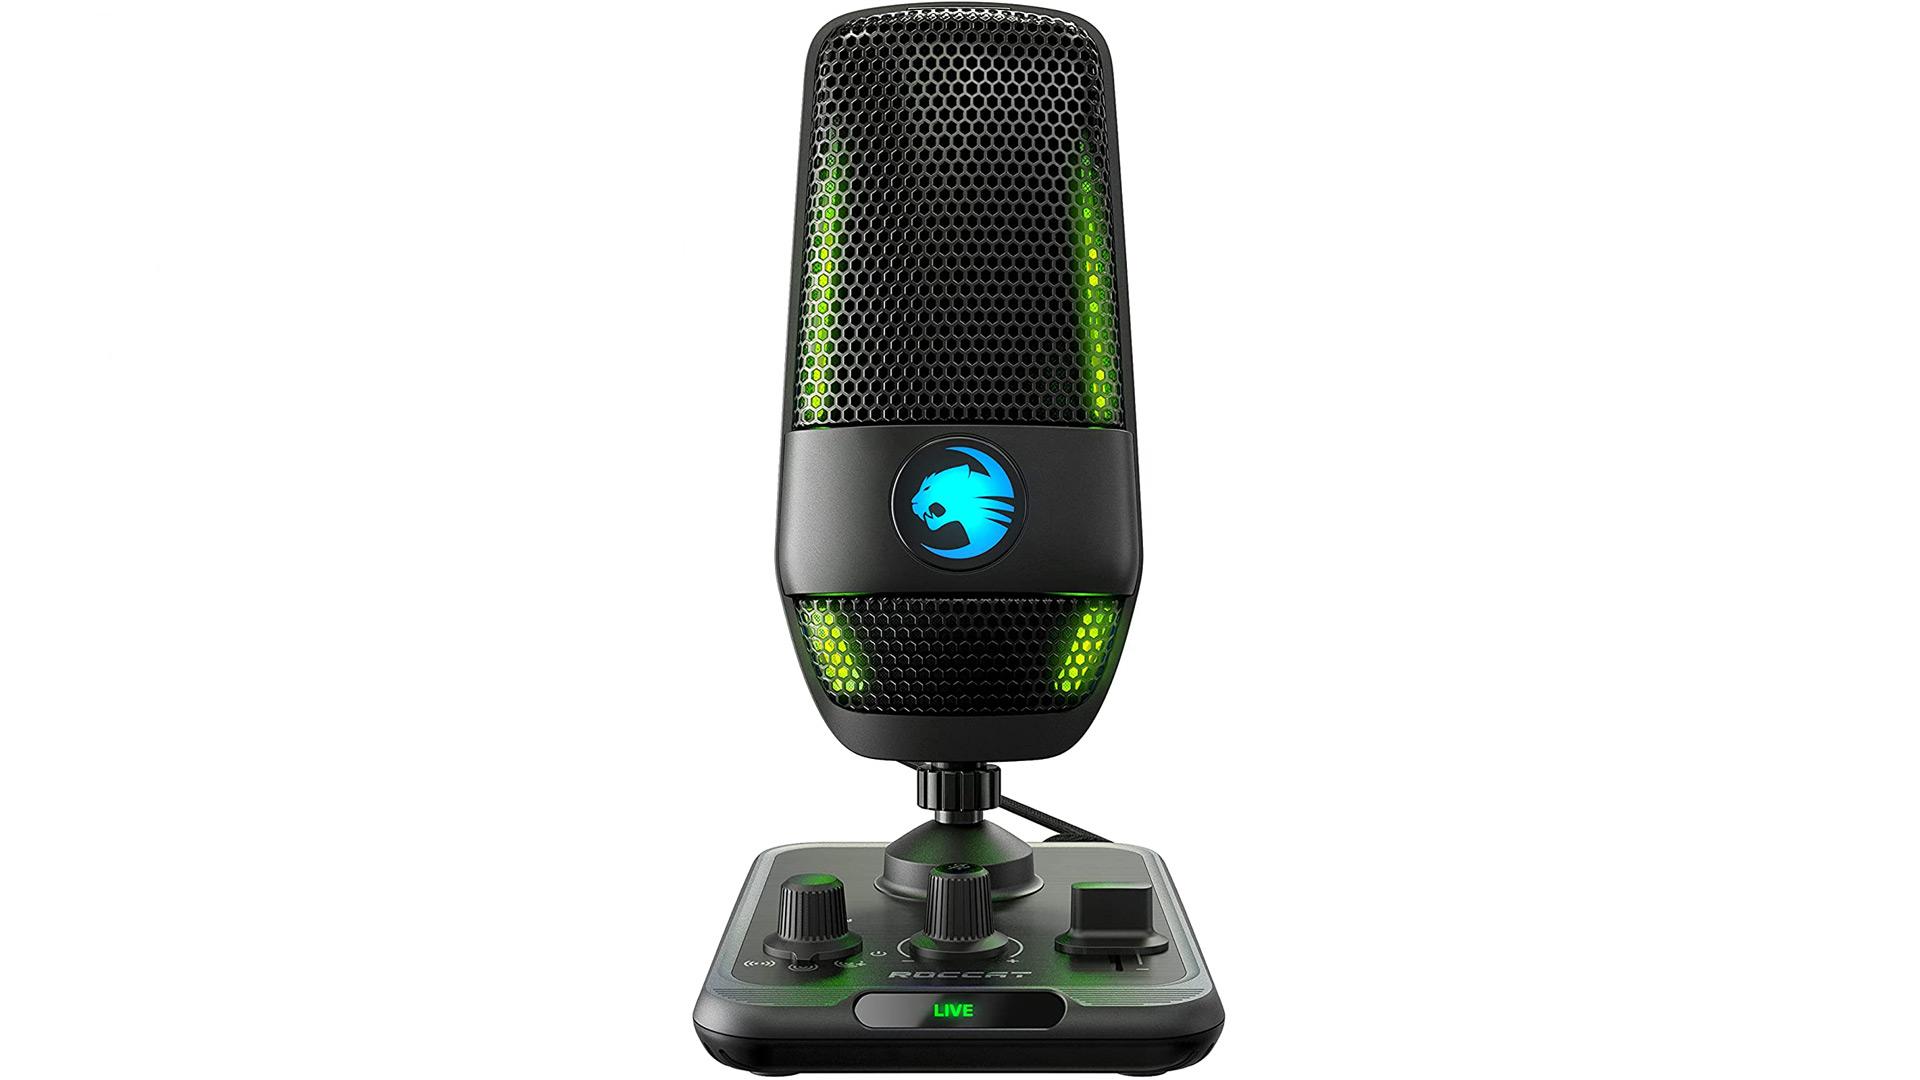 Roccat Torch USB Microphone